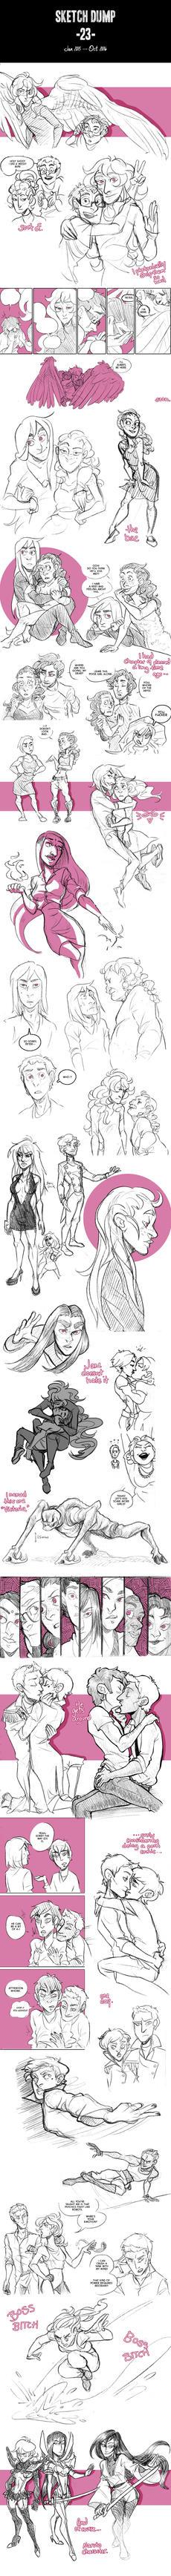 Sketch Dump 23 by arswiss